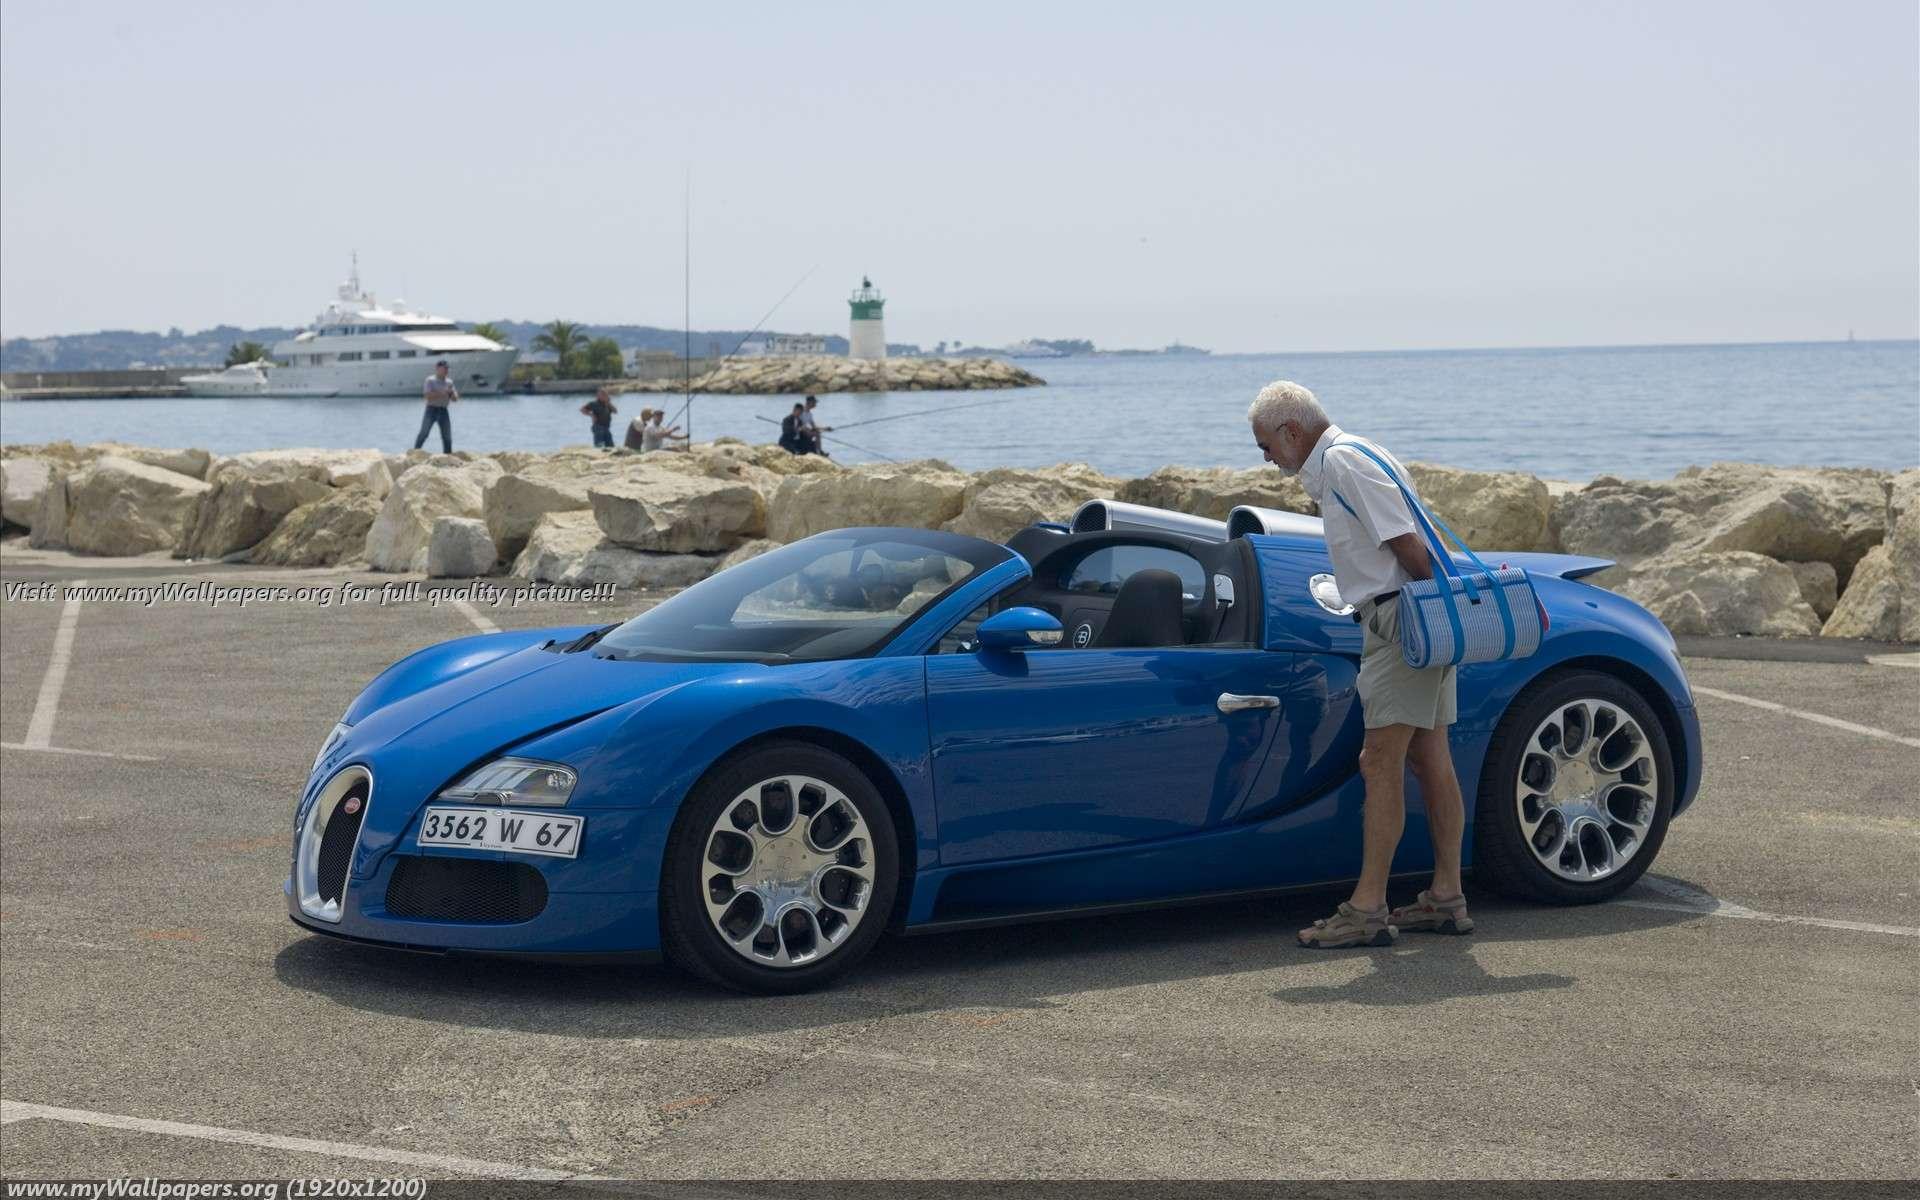 Bugatti Veyron Wallpaper Widescreen 4864 Hd Wallpapers in Cars 1920x1200